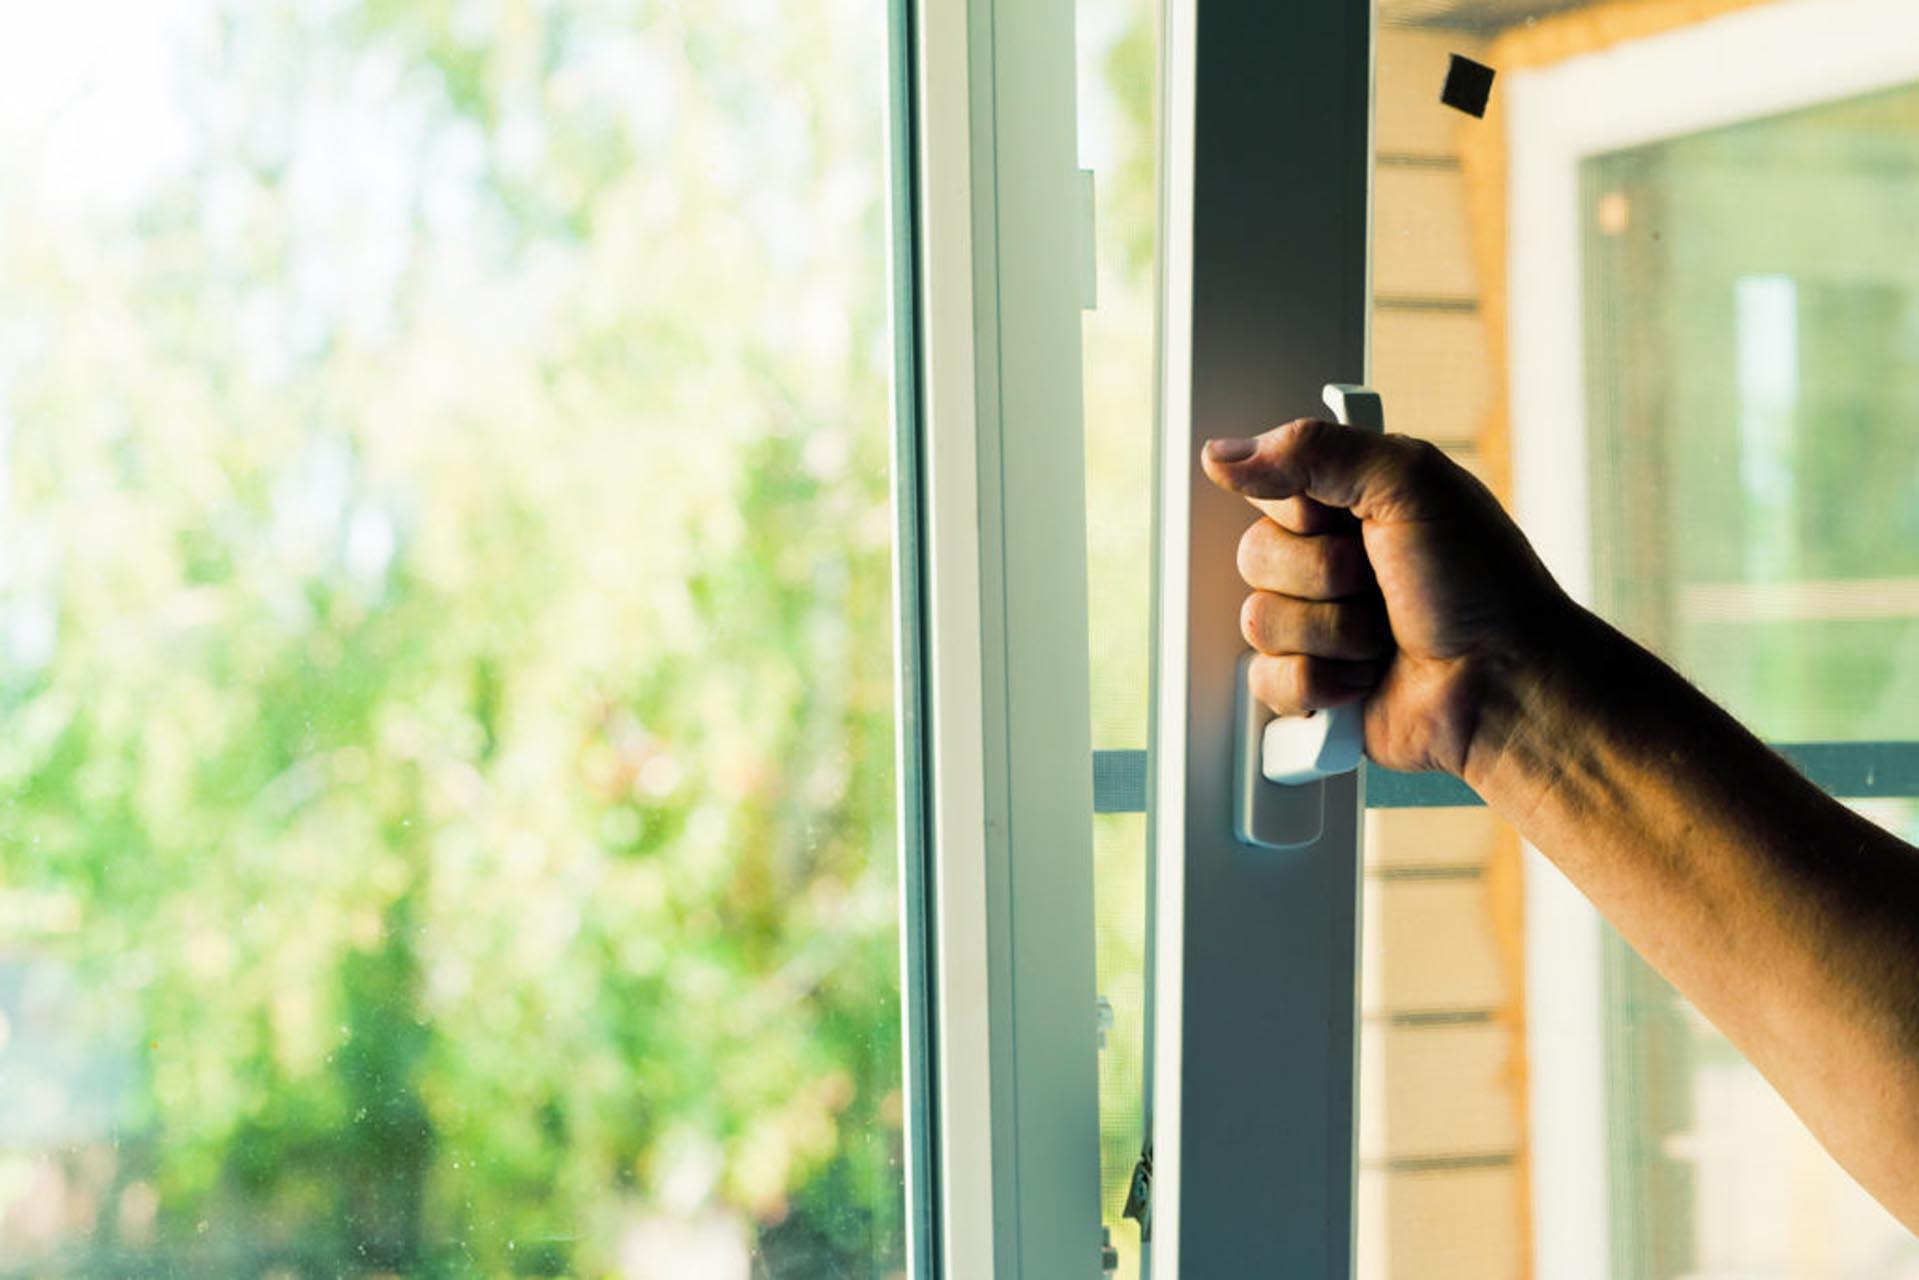 fenêtres chambery - fenêtre annecy - vitrerie savoyarde